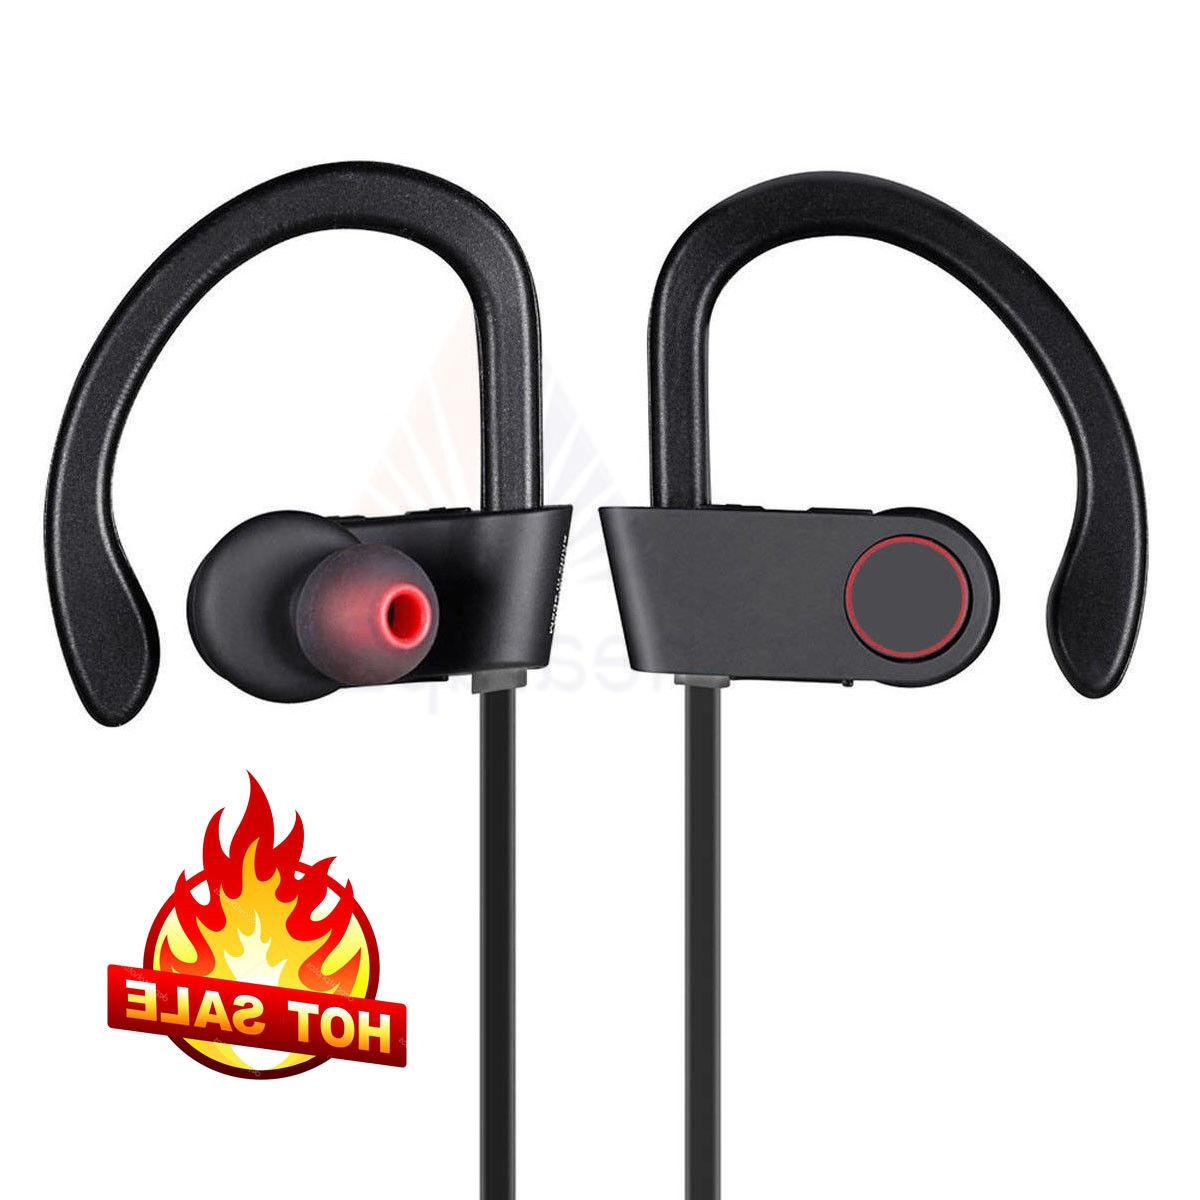 invictus D-20 Headphones Best Sports Workout Wireless Earbuds